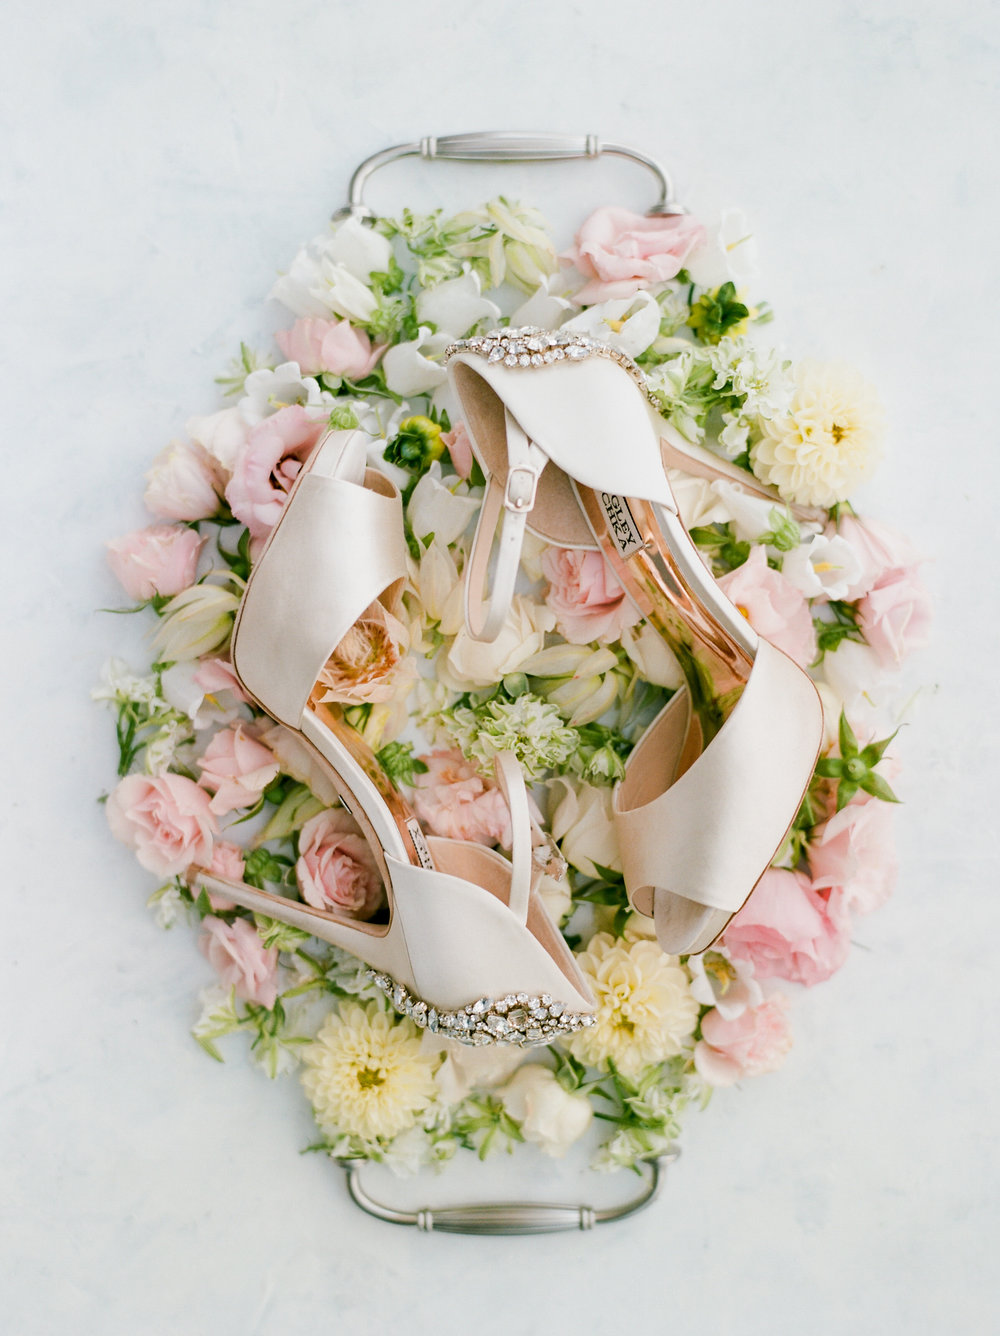 Martha-Stewart-Wedding-Dana-Fernandez-Photography-Josh-Texas-Film-Houston-Wedding-Fine-Art-Photographer-McGovern-Centennial-Gardens-Top-Best-11.jpg